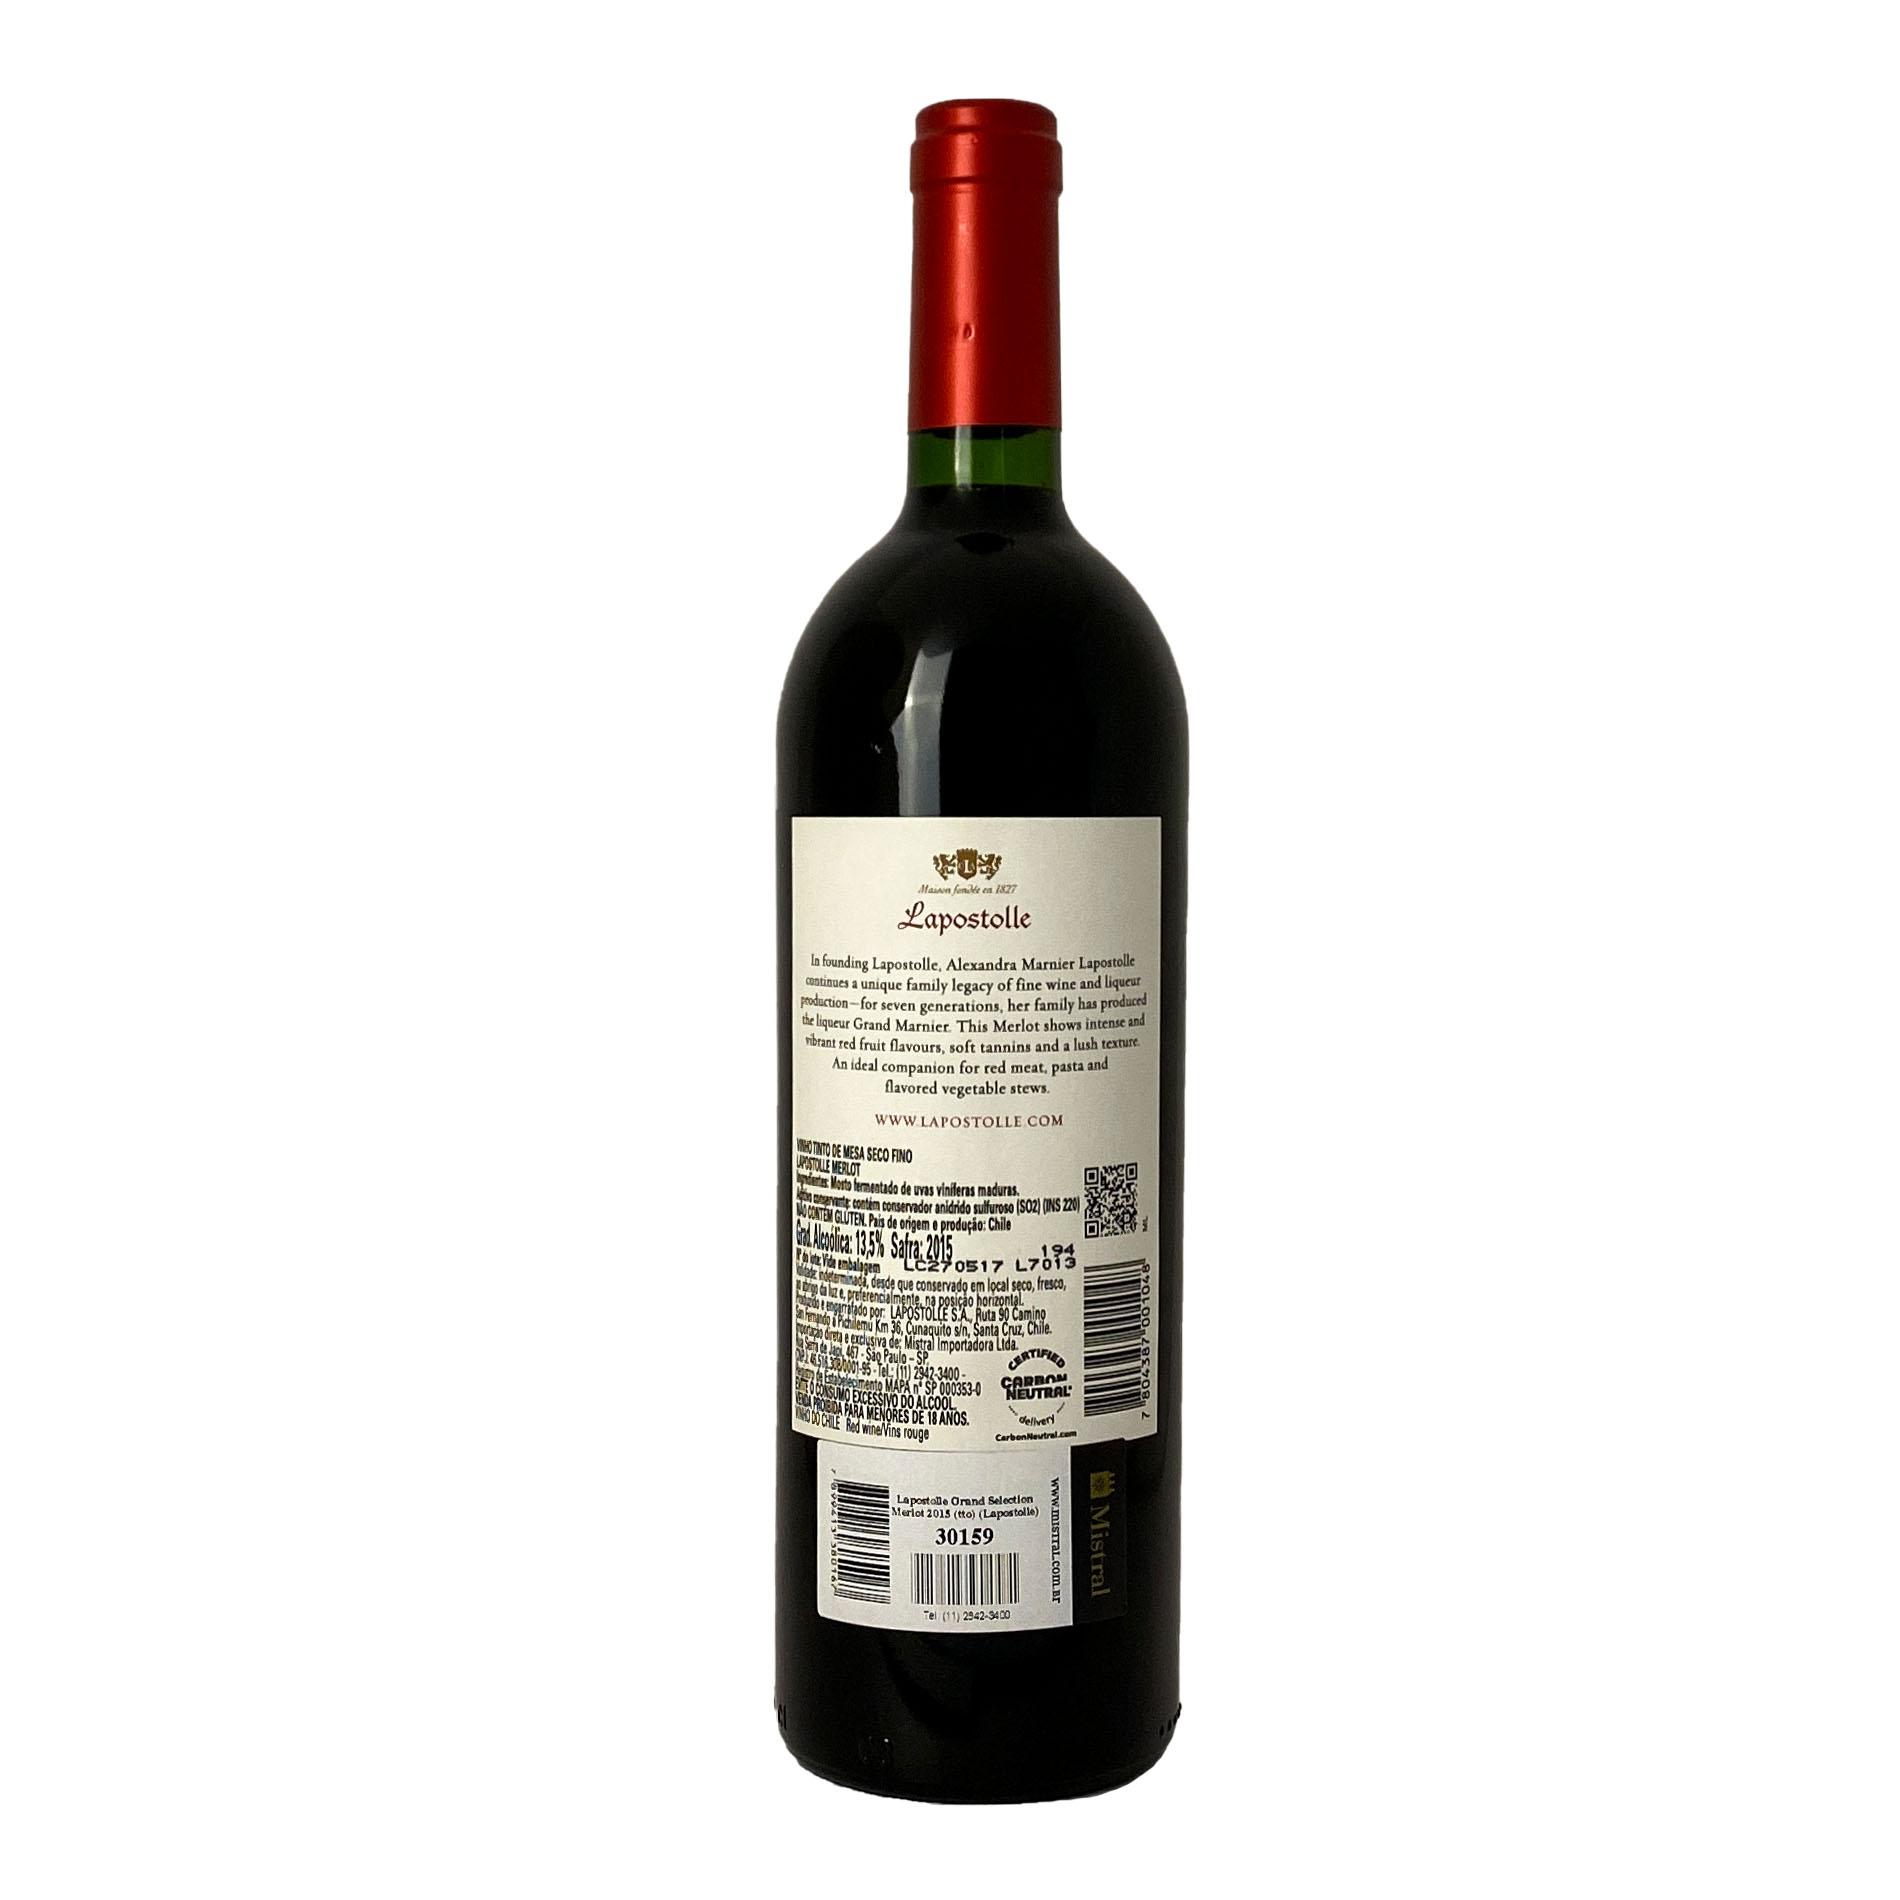 Lapostolle Grand Selection Merlot  - Vinerize